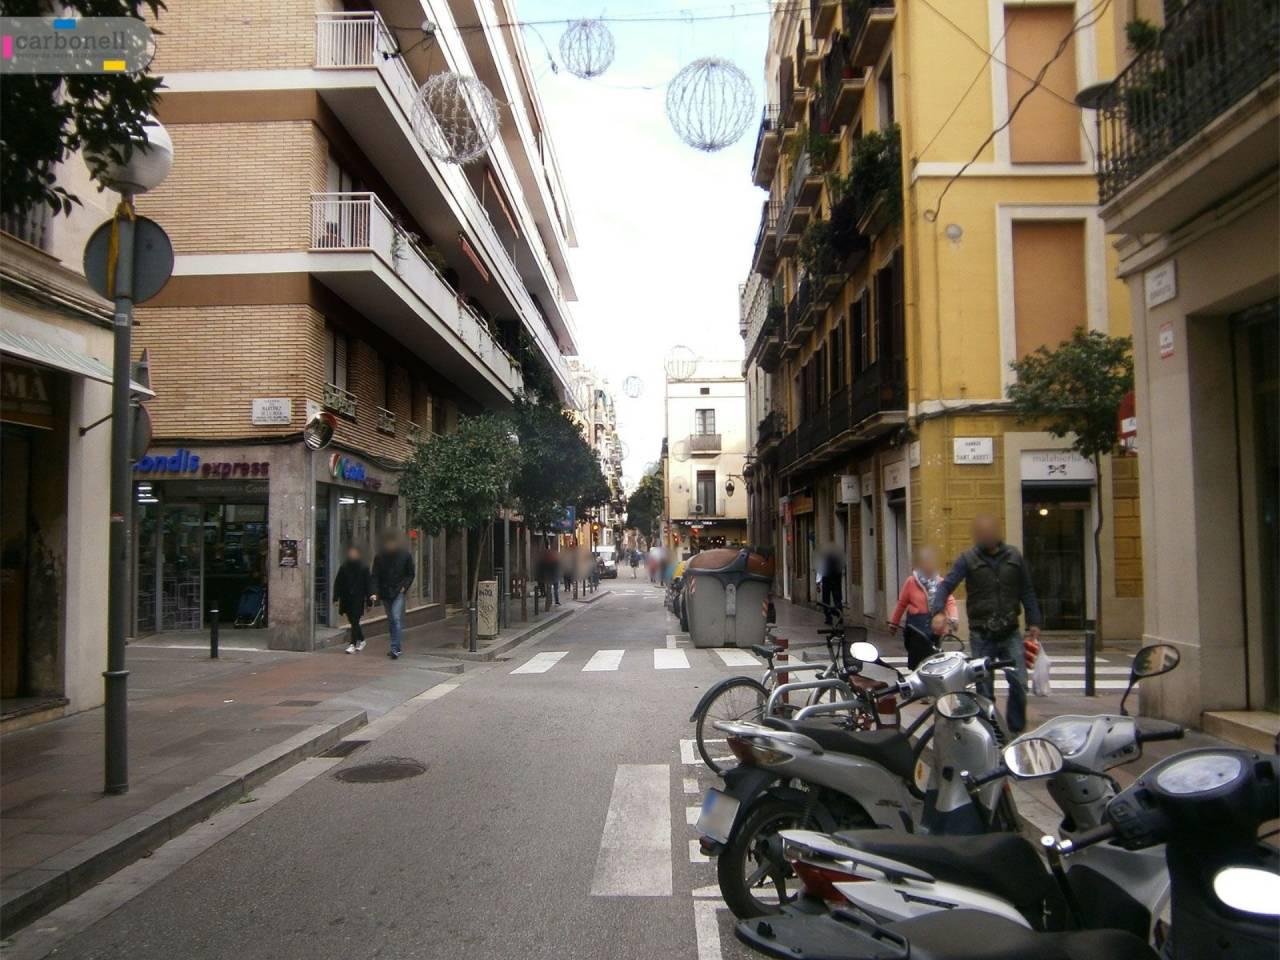 Local en alquiler La Vila de Gràcia (Barcelona Capital)